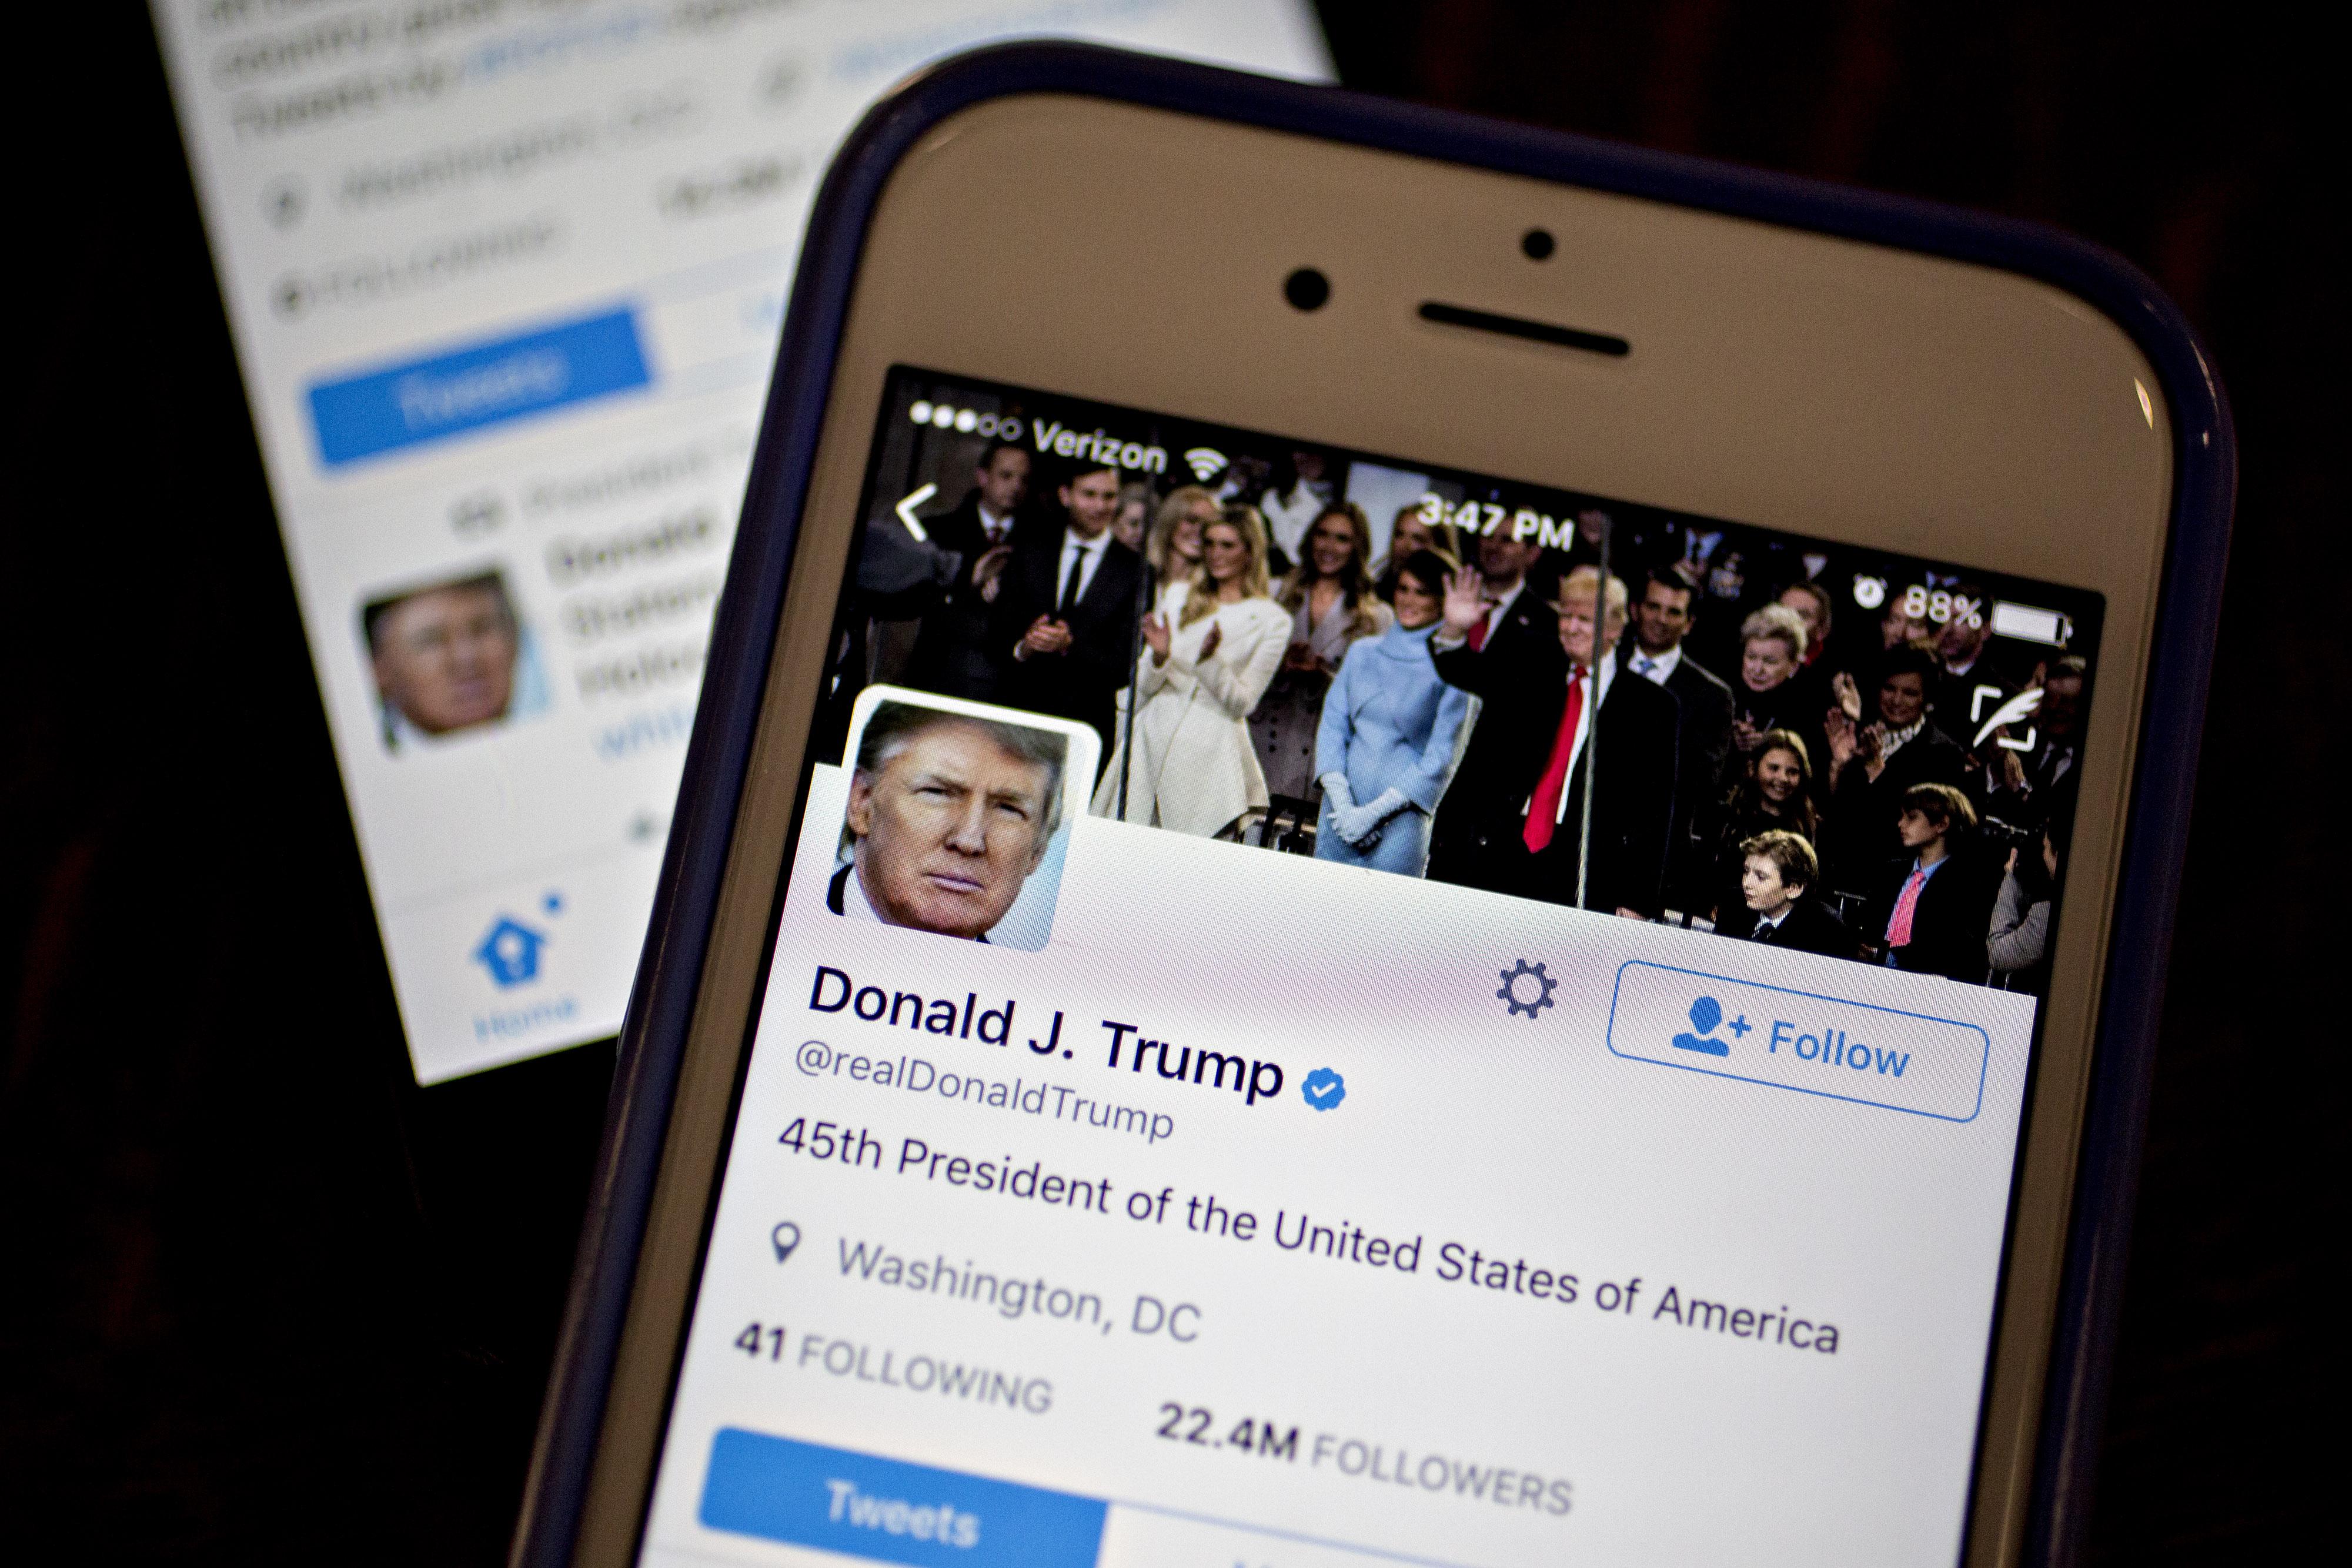 pbs.org - Lisa Desjardins - We asked every senator for their reaction to Trump's anti-Muslim retweets